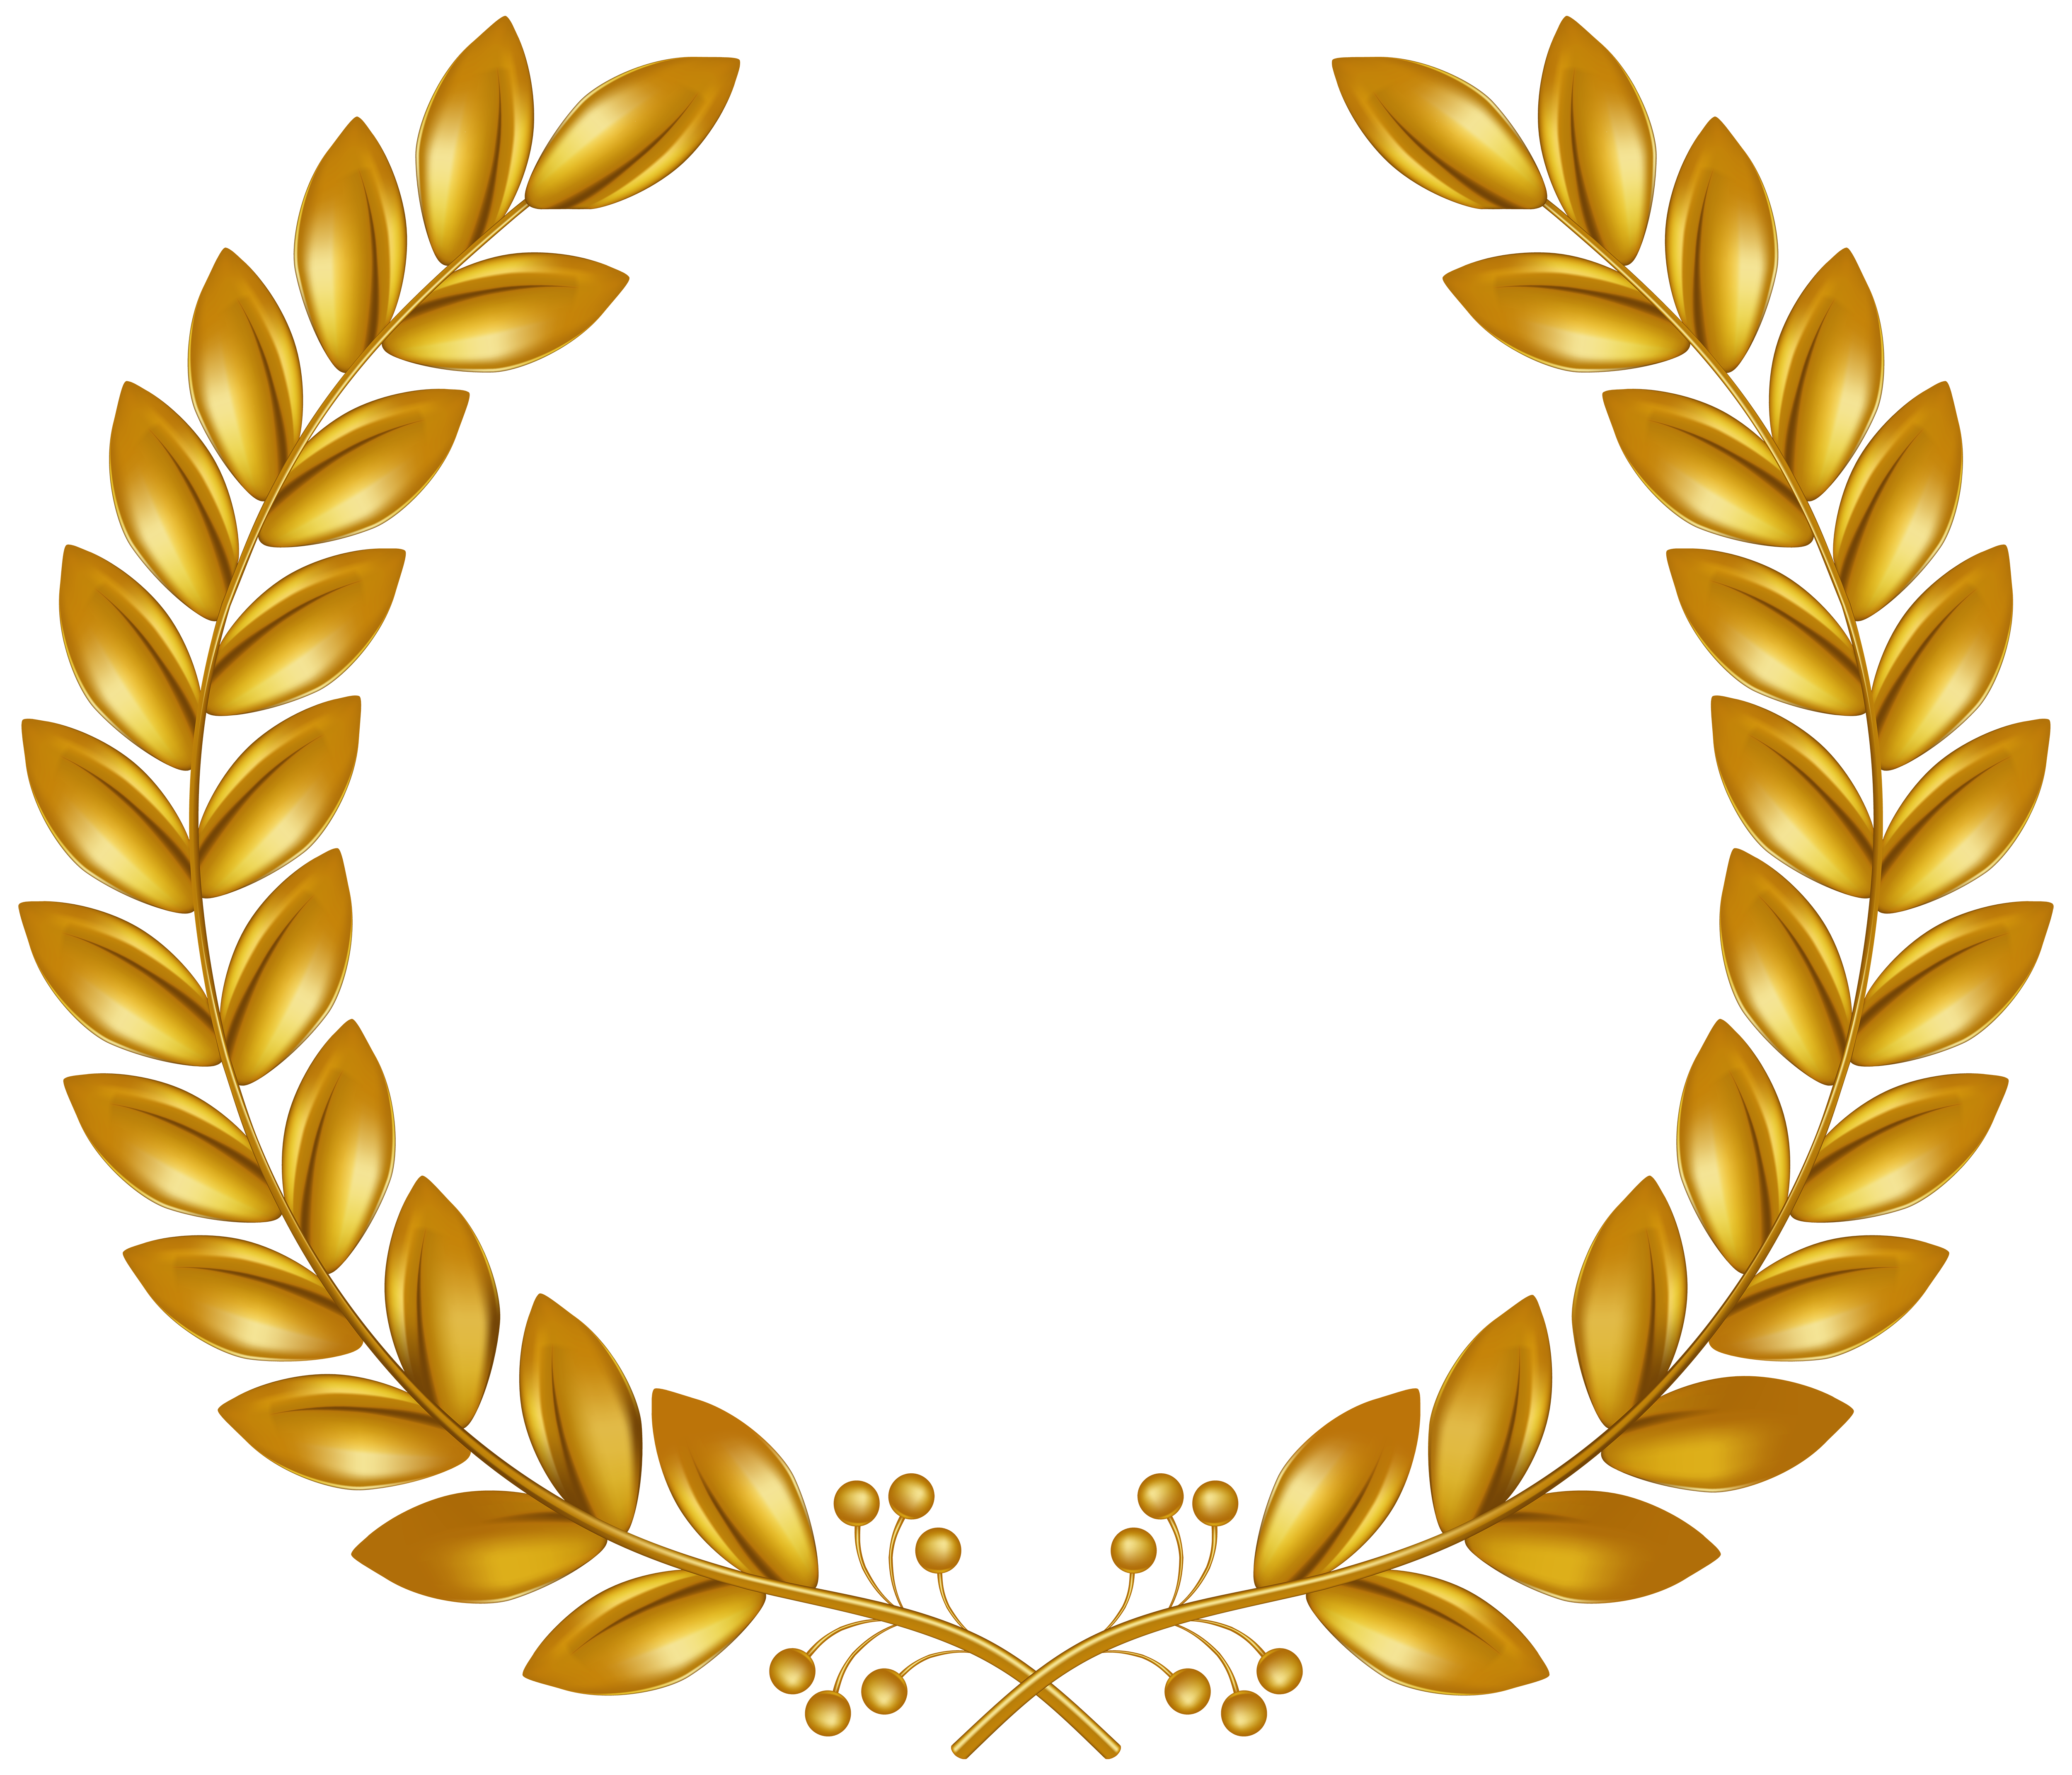 graphic freeuse Wreath png clip art. Golden clipart transparent